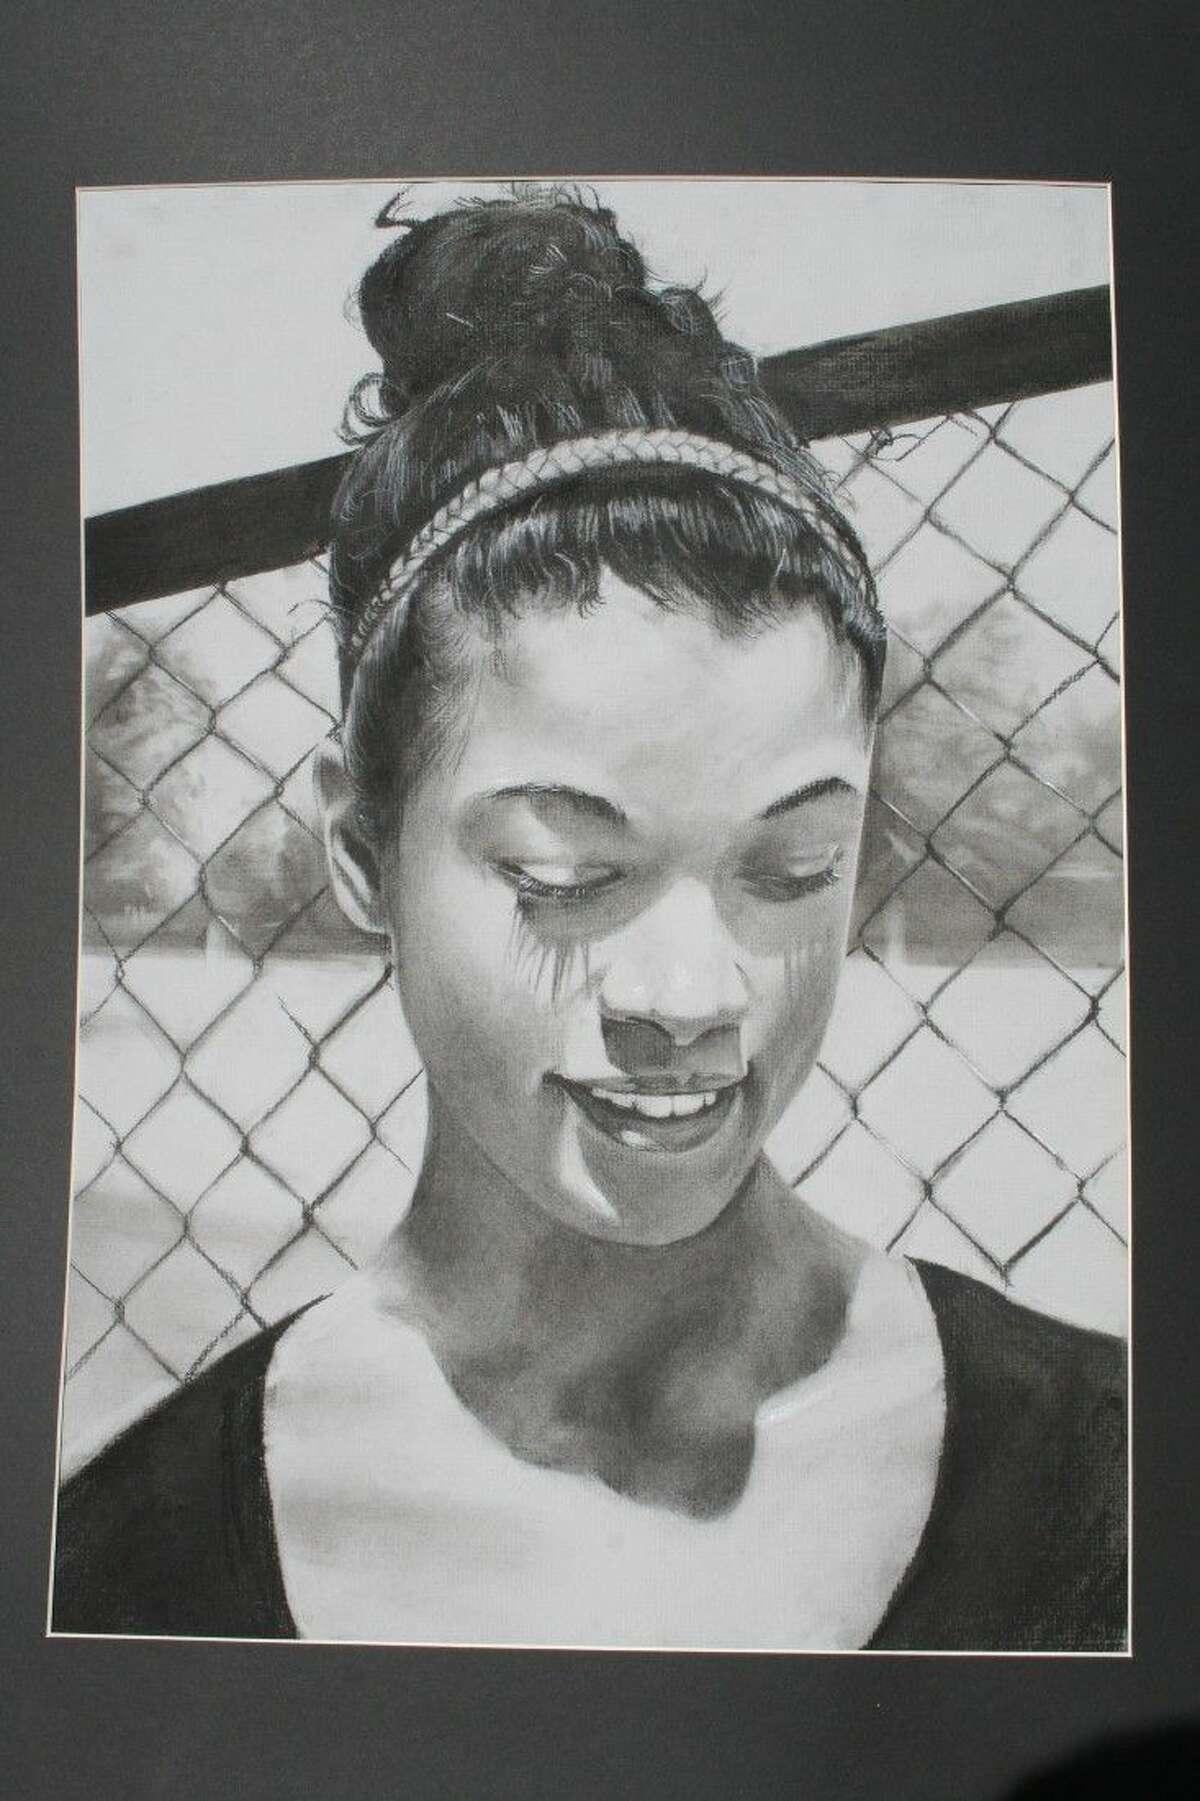 Happiness Drawing & Illustration by Kurt Arzaga, Atascocita High School; Instructor: Steffani Zachry-Holubec.